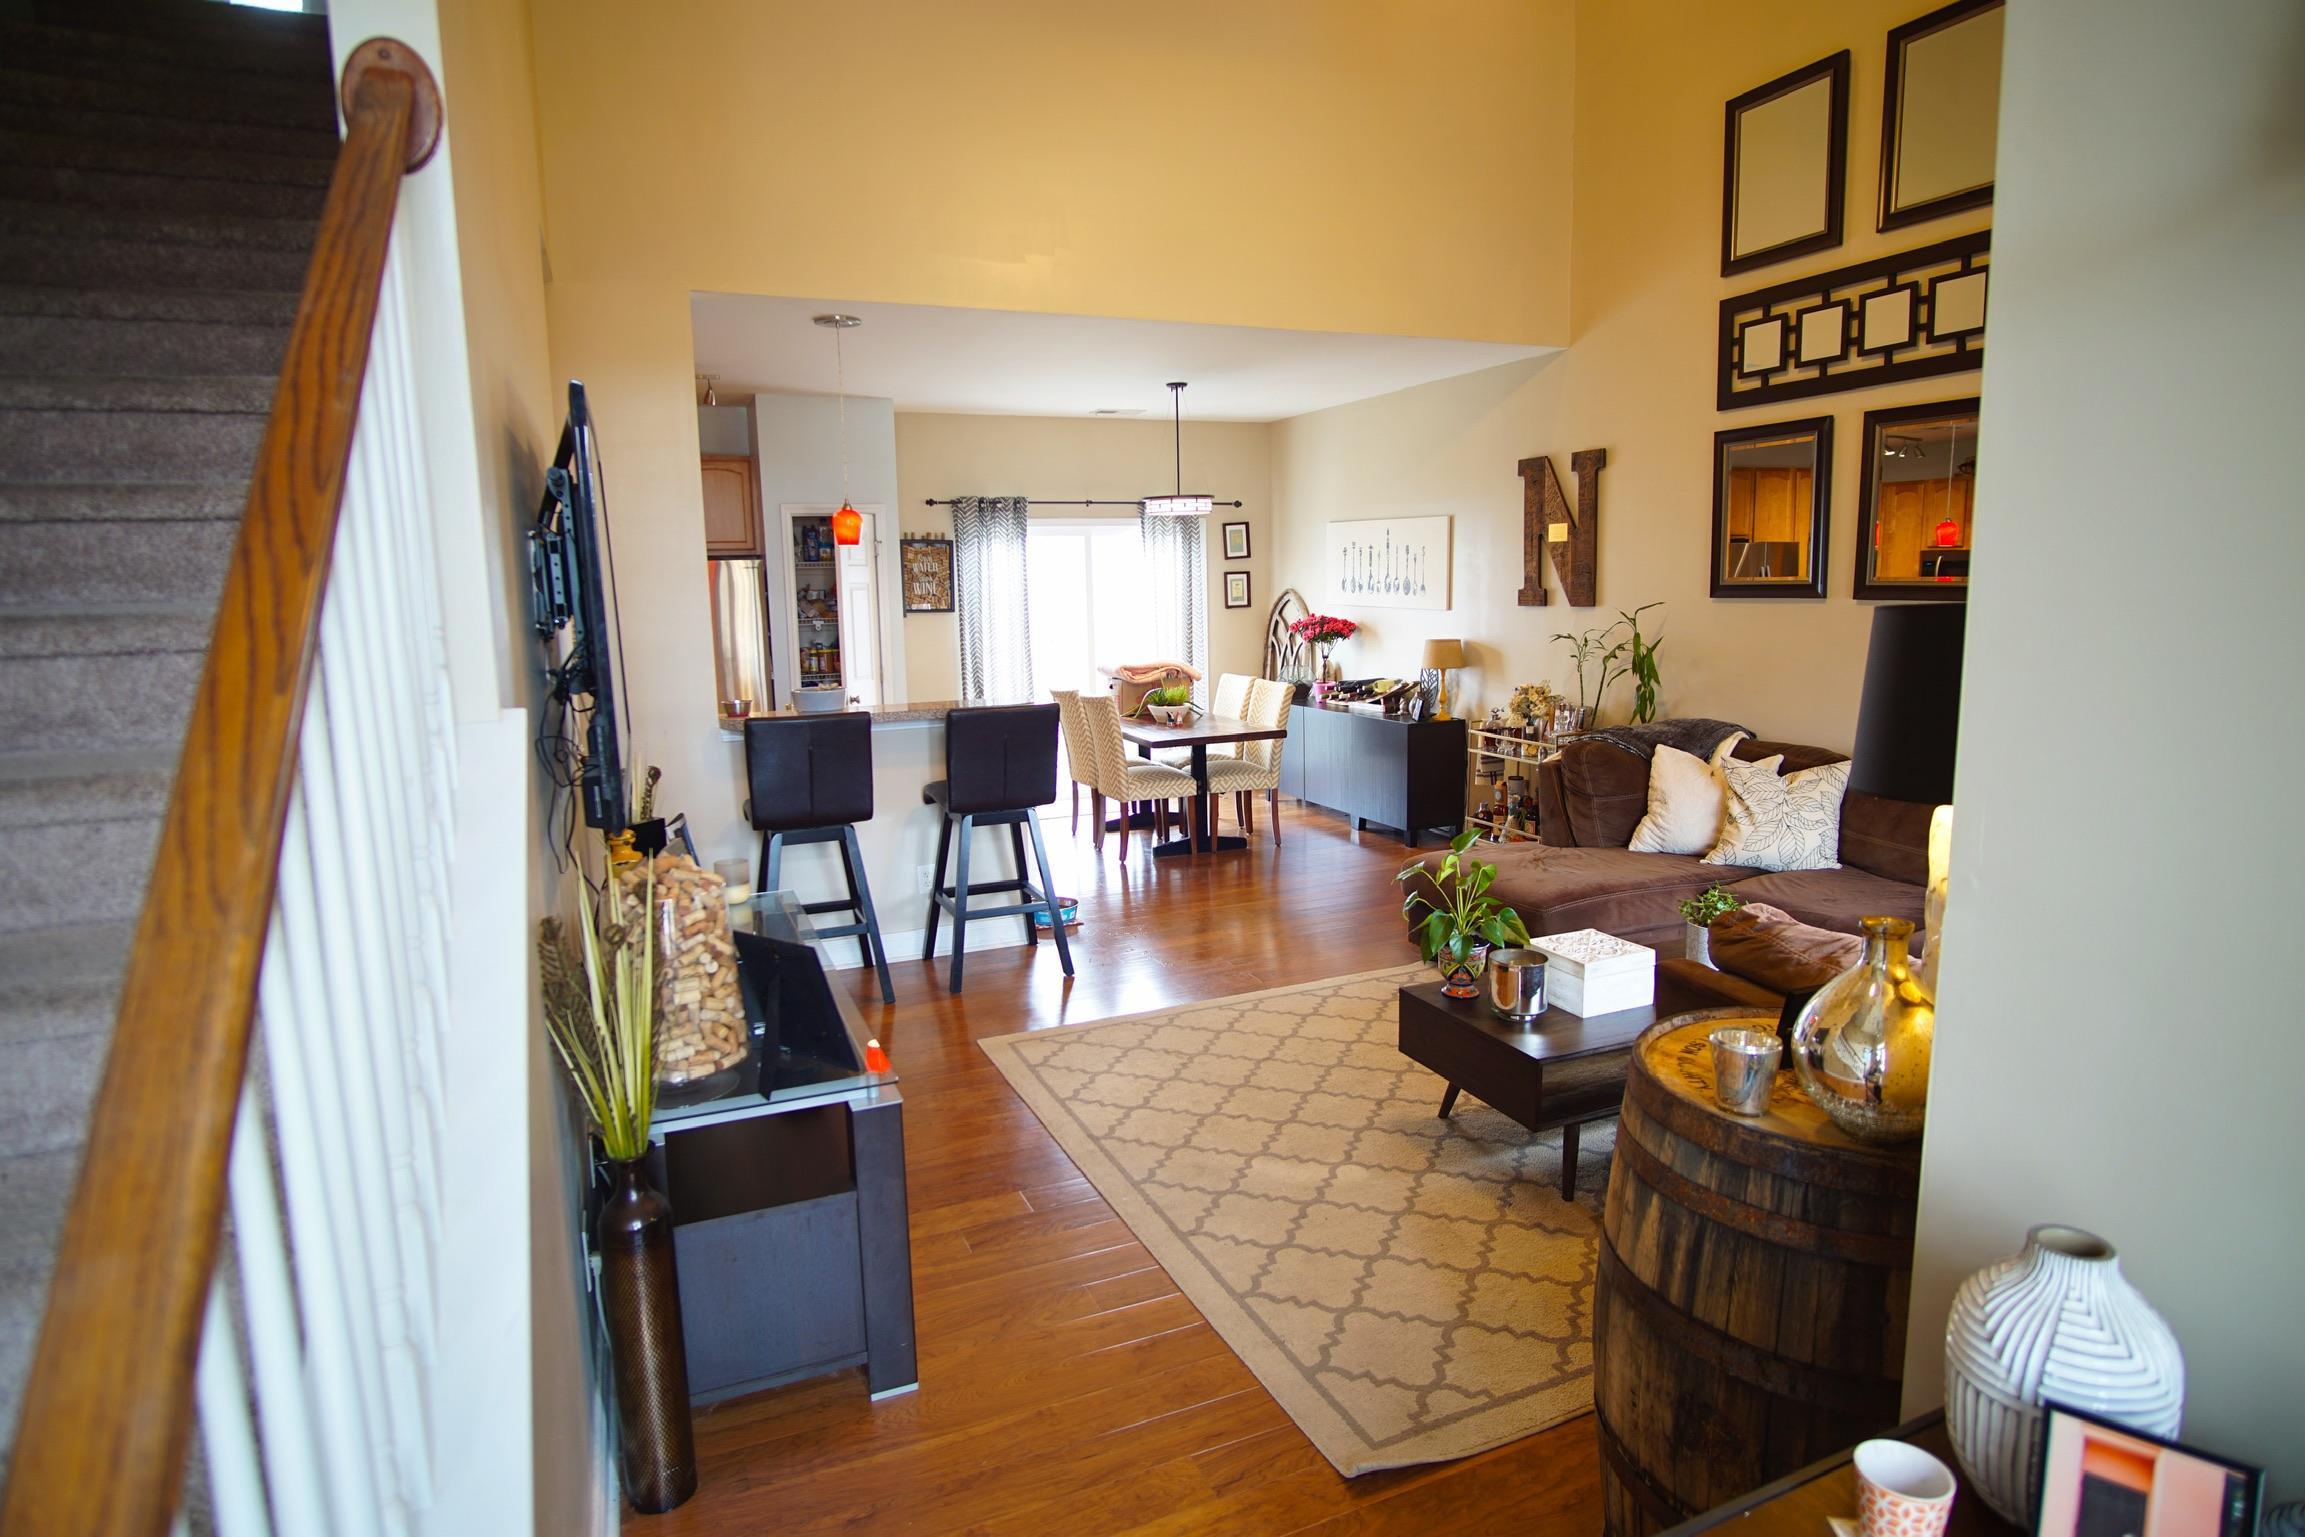 Colony North II Homes For Sale - 7828 Magellan, North Charleston, SC - 5